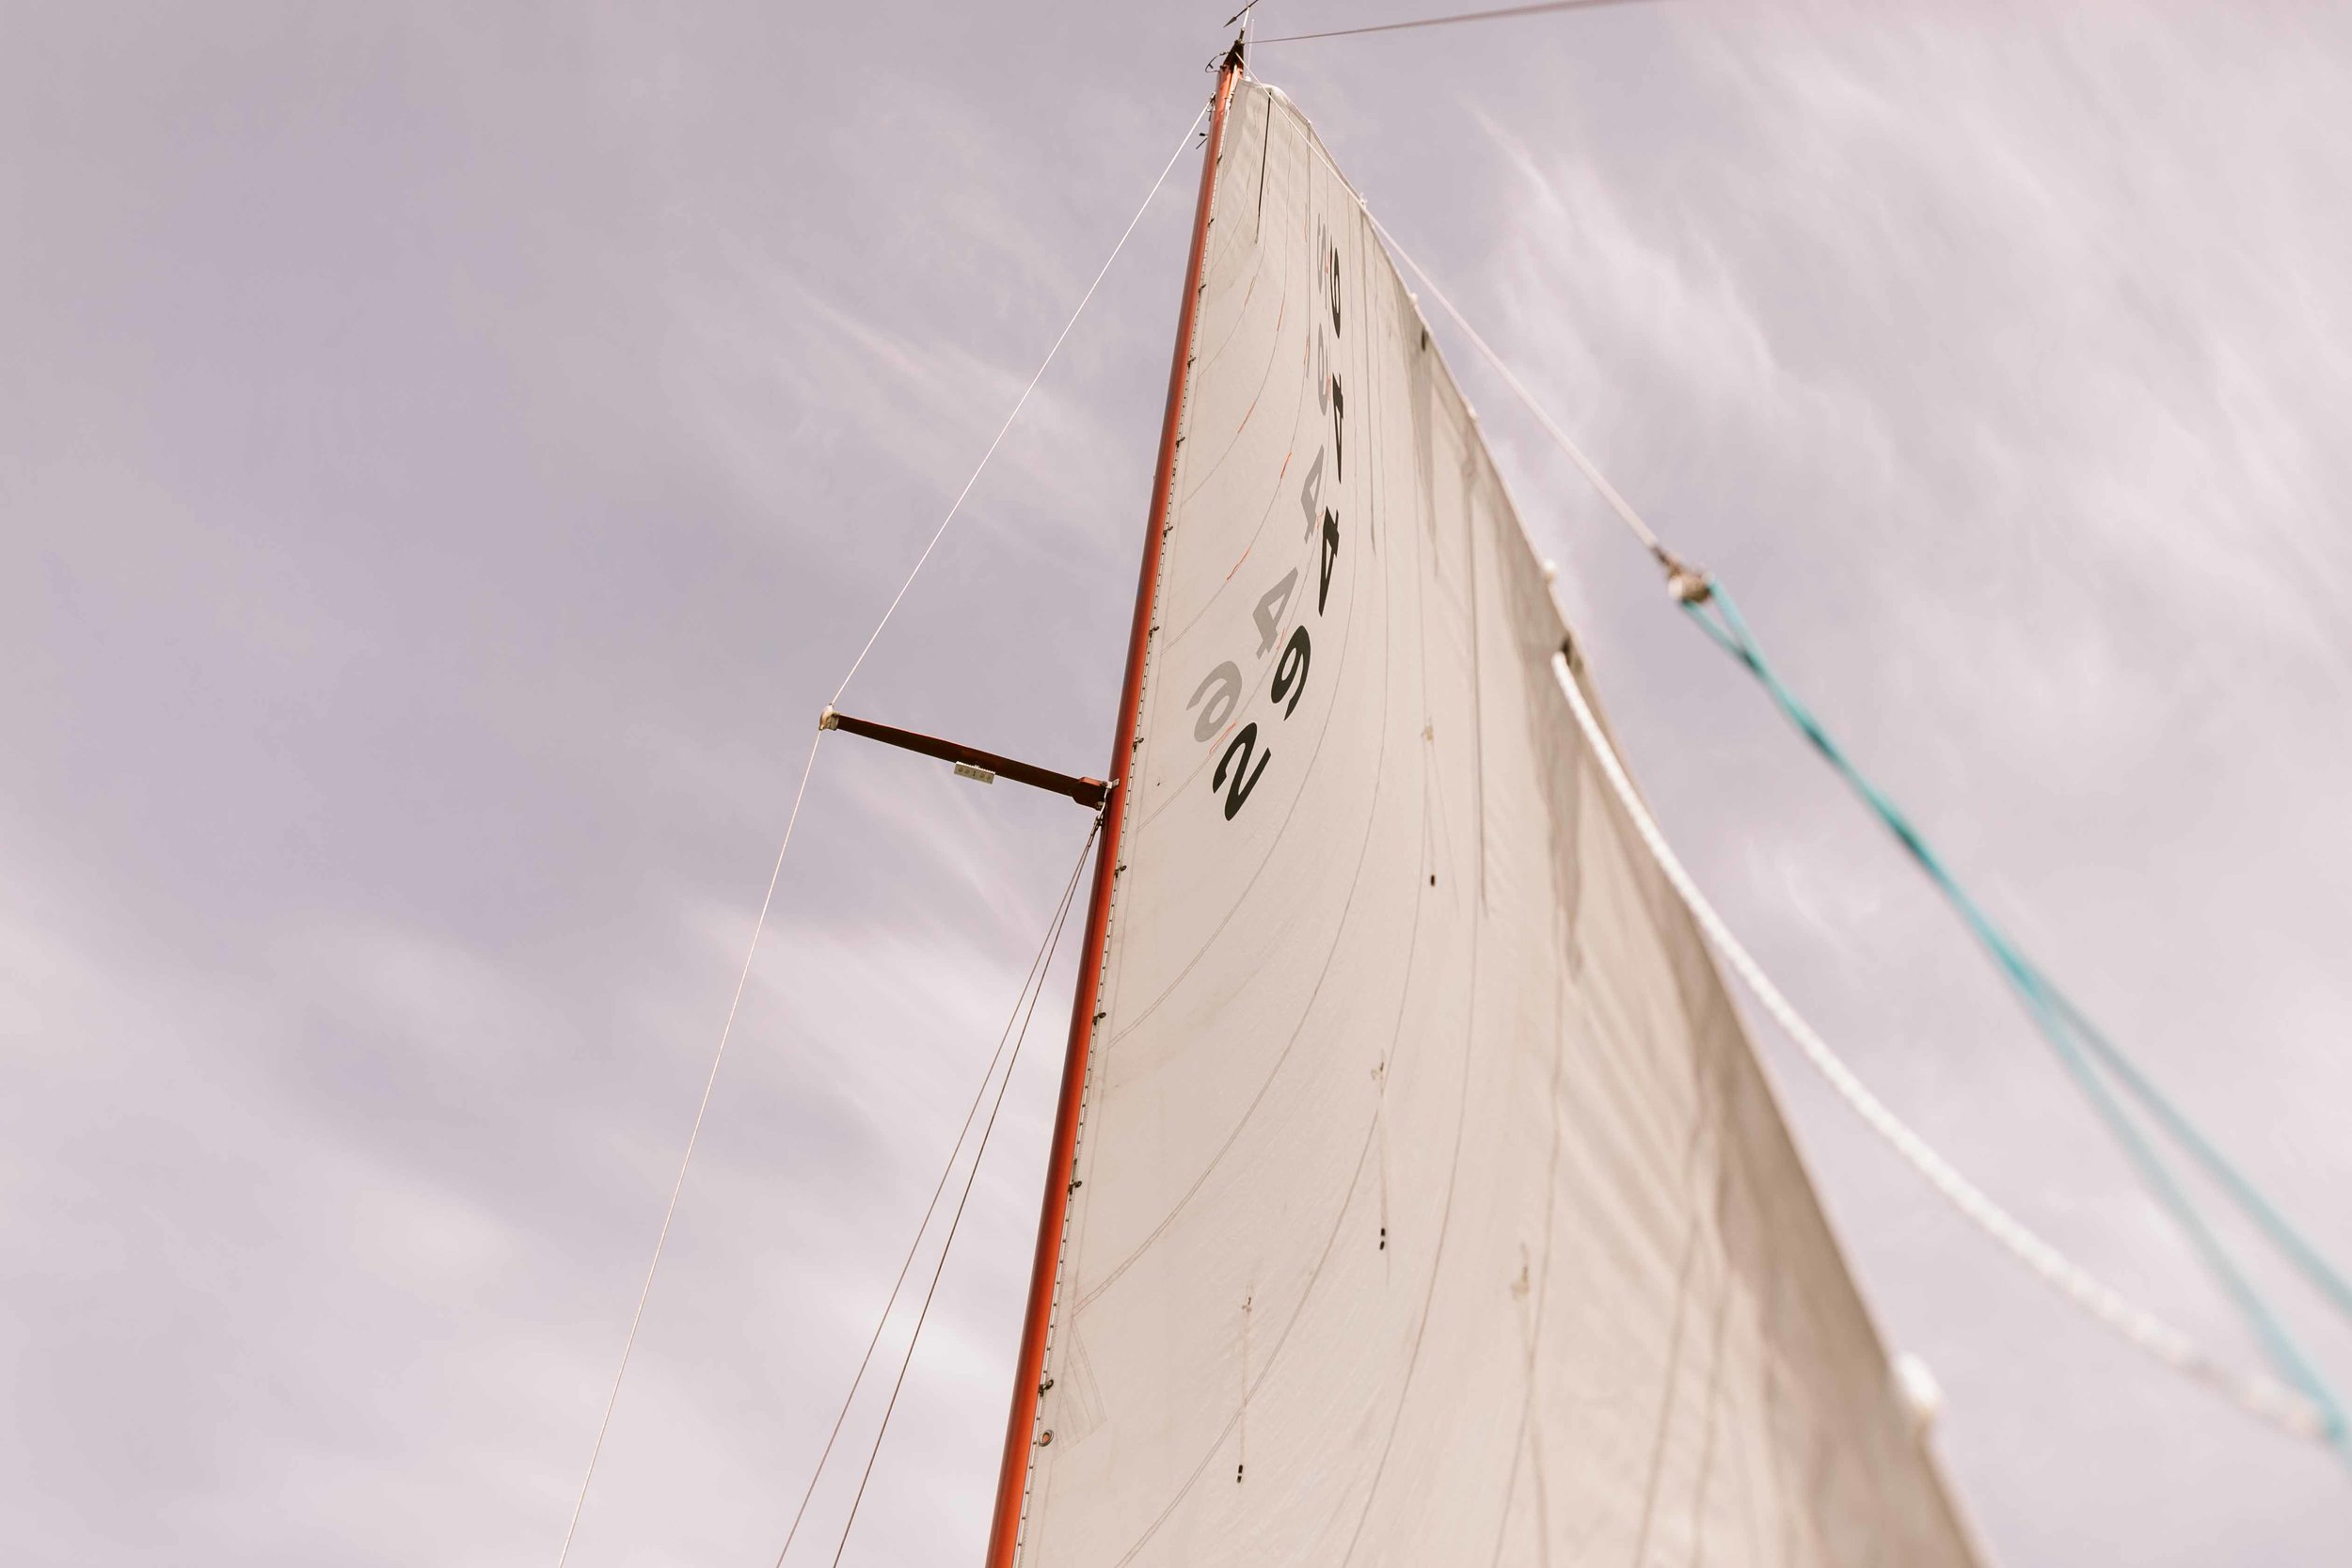 sailboat-engagement-photos-9.jpg